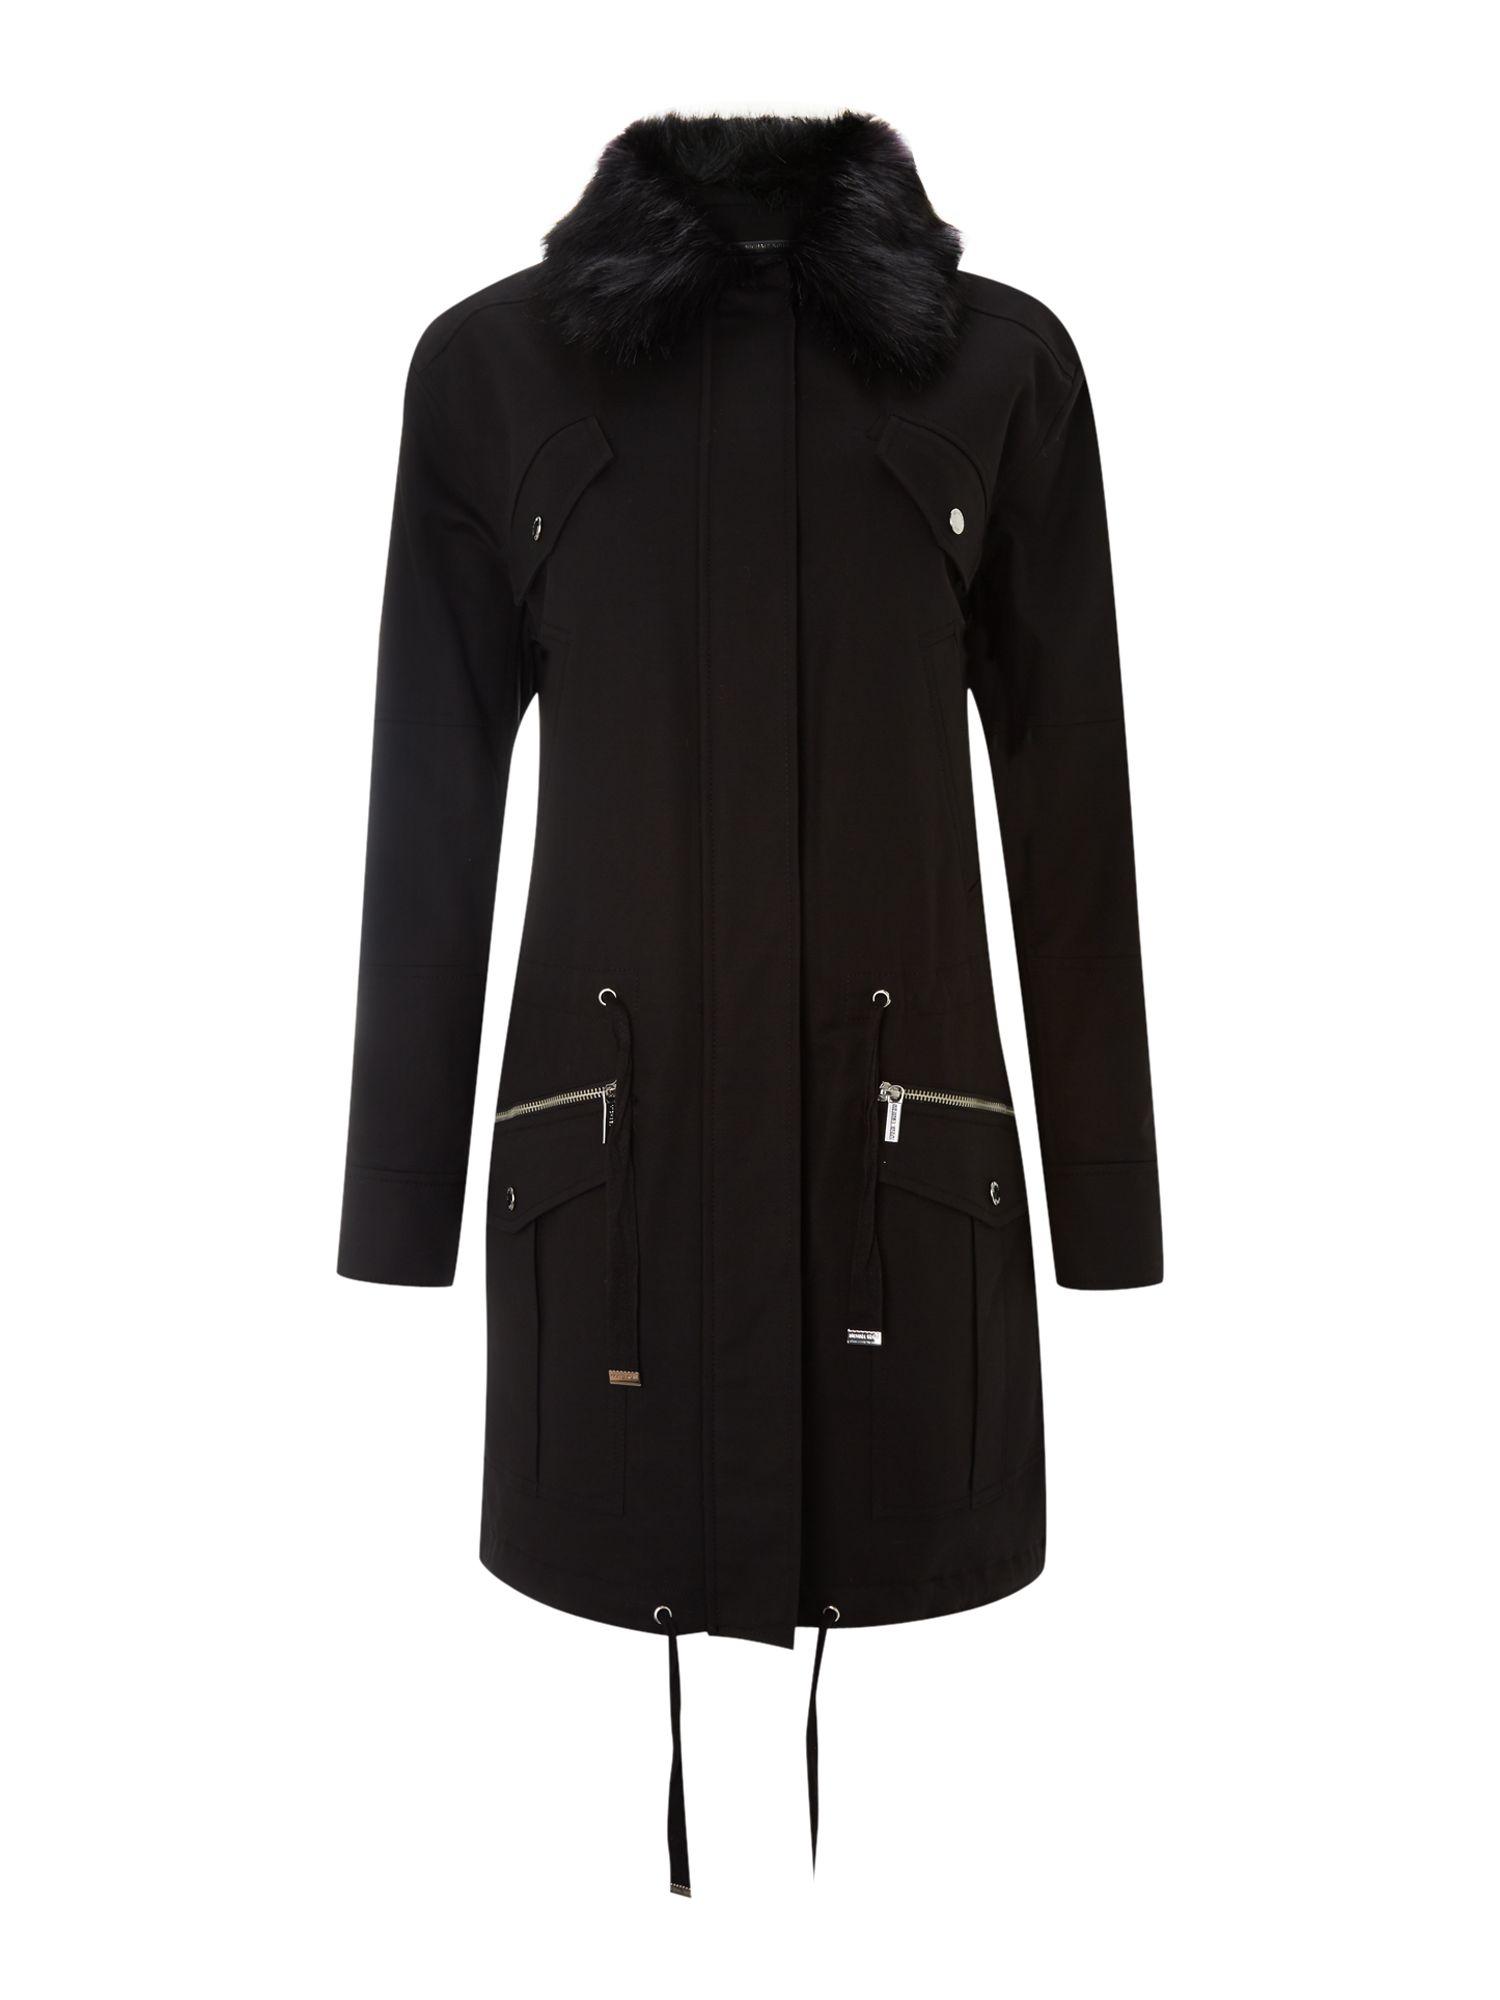 Michael Kors Parka Jacket with Faux Fur Trim in Black | Lyst